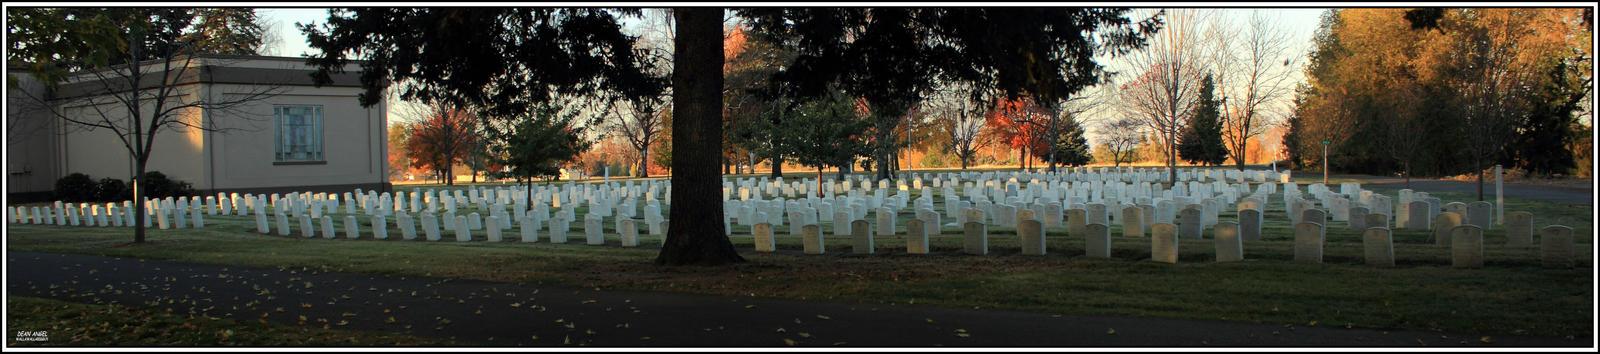 Veterans Day 2014 by wallawallabigguy